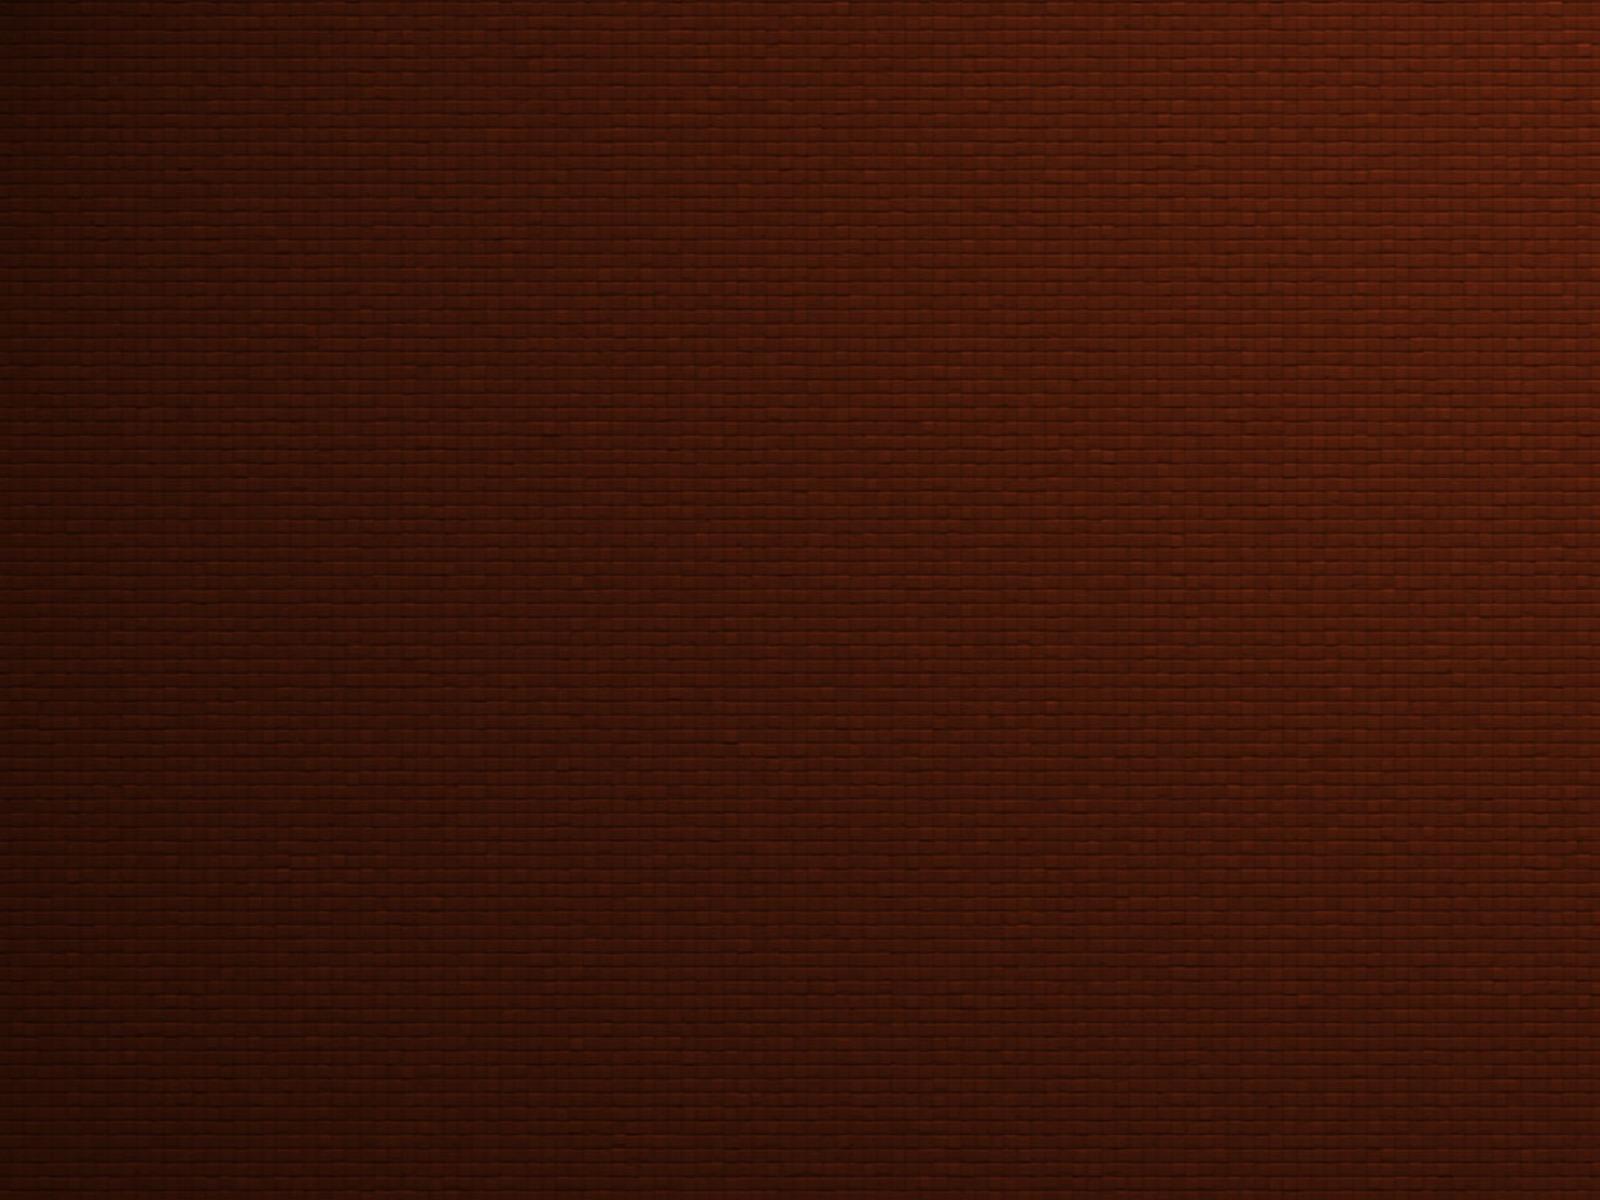 1600x1200 Brown Windows Wallpaper Abstract Brown Wallpaper 1600x1200